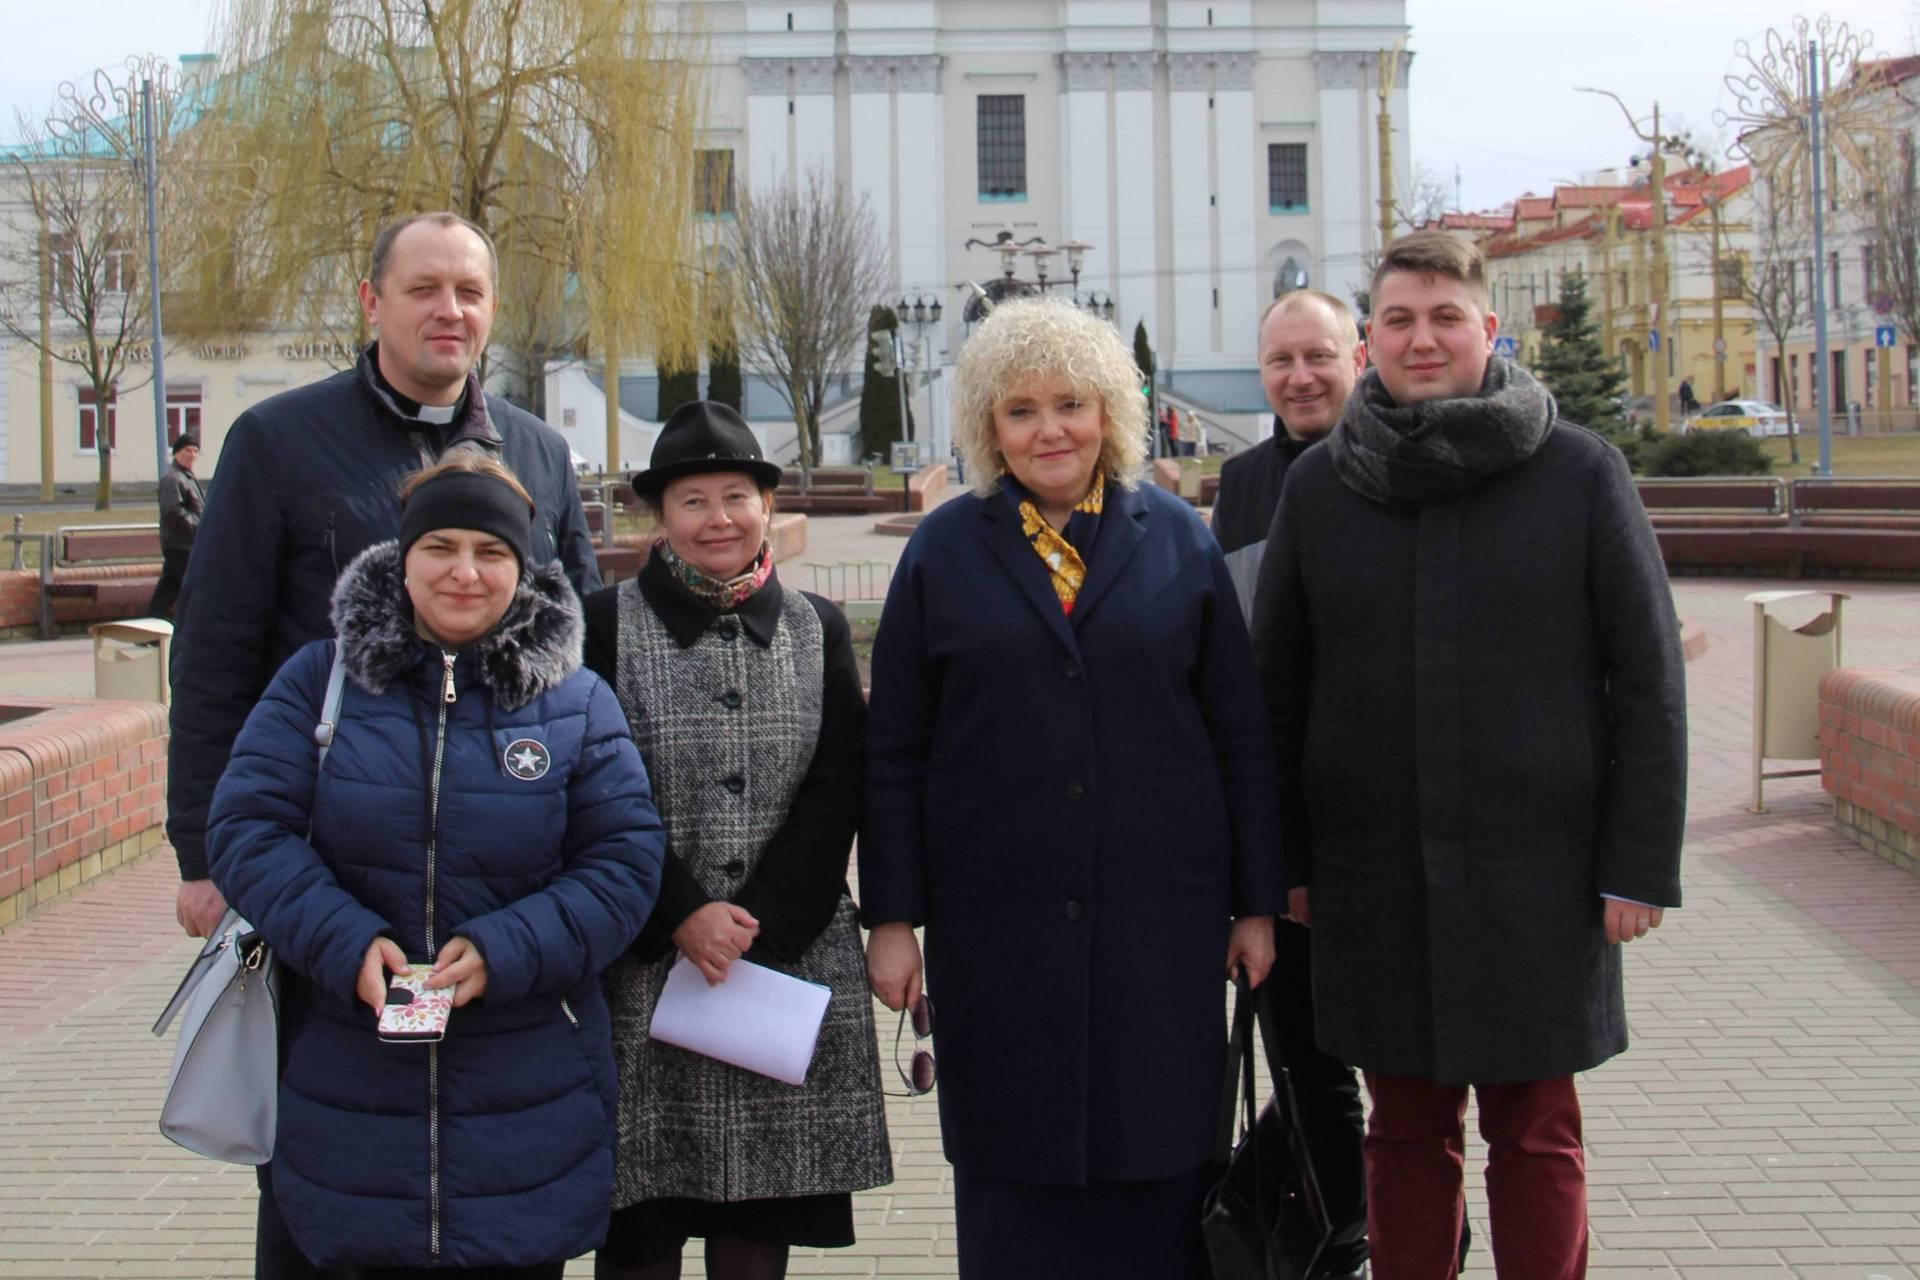 Polak z sercem! Białoruś